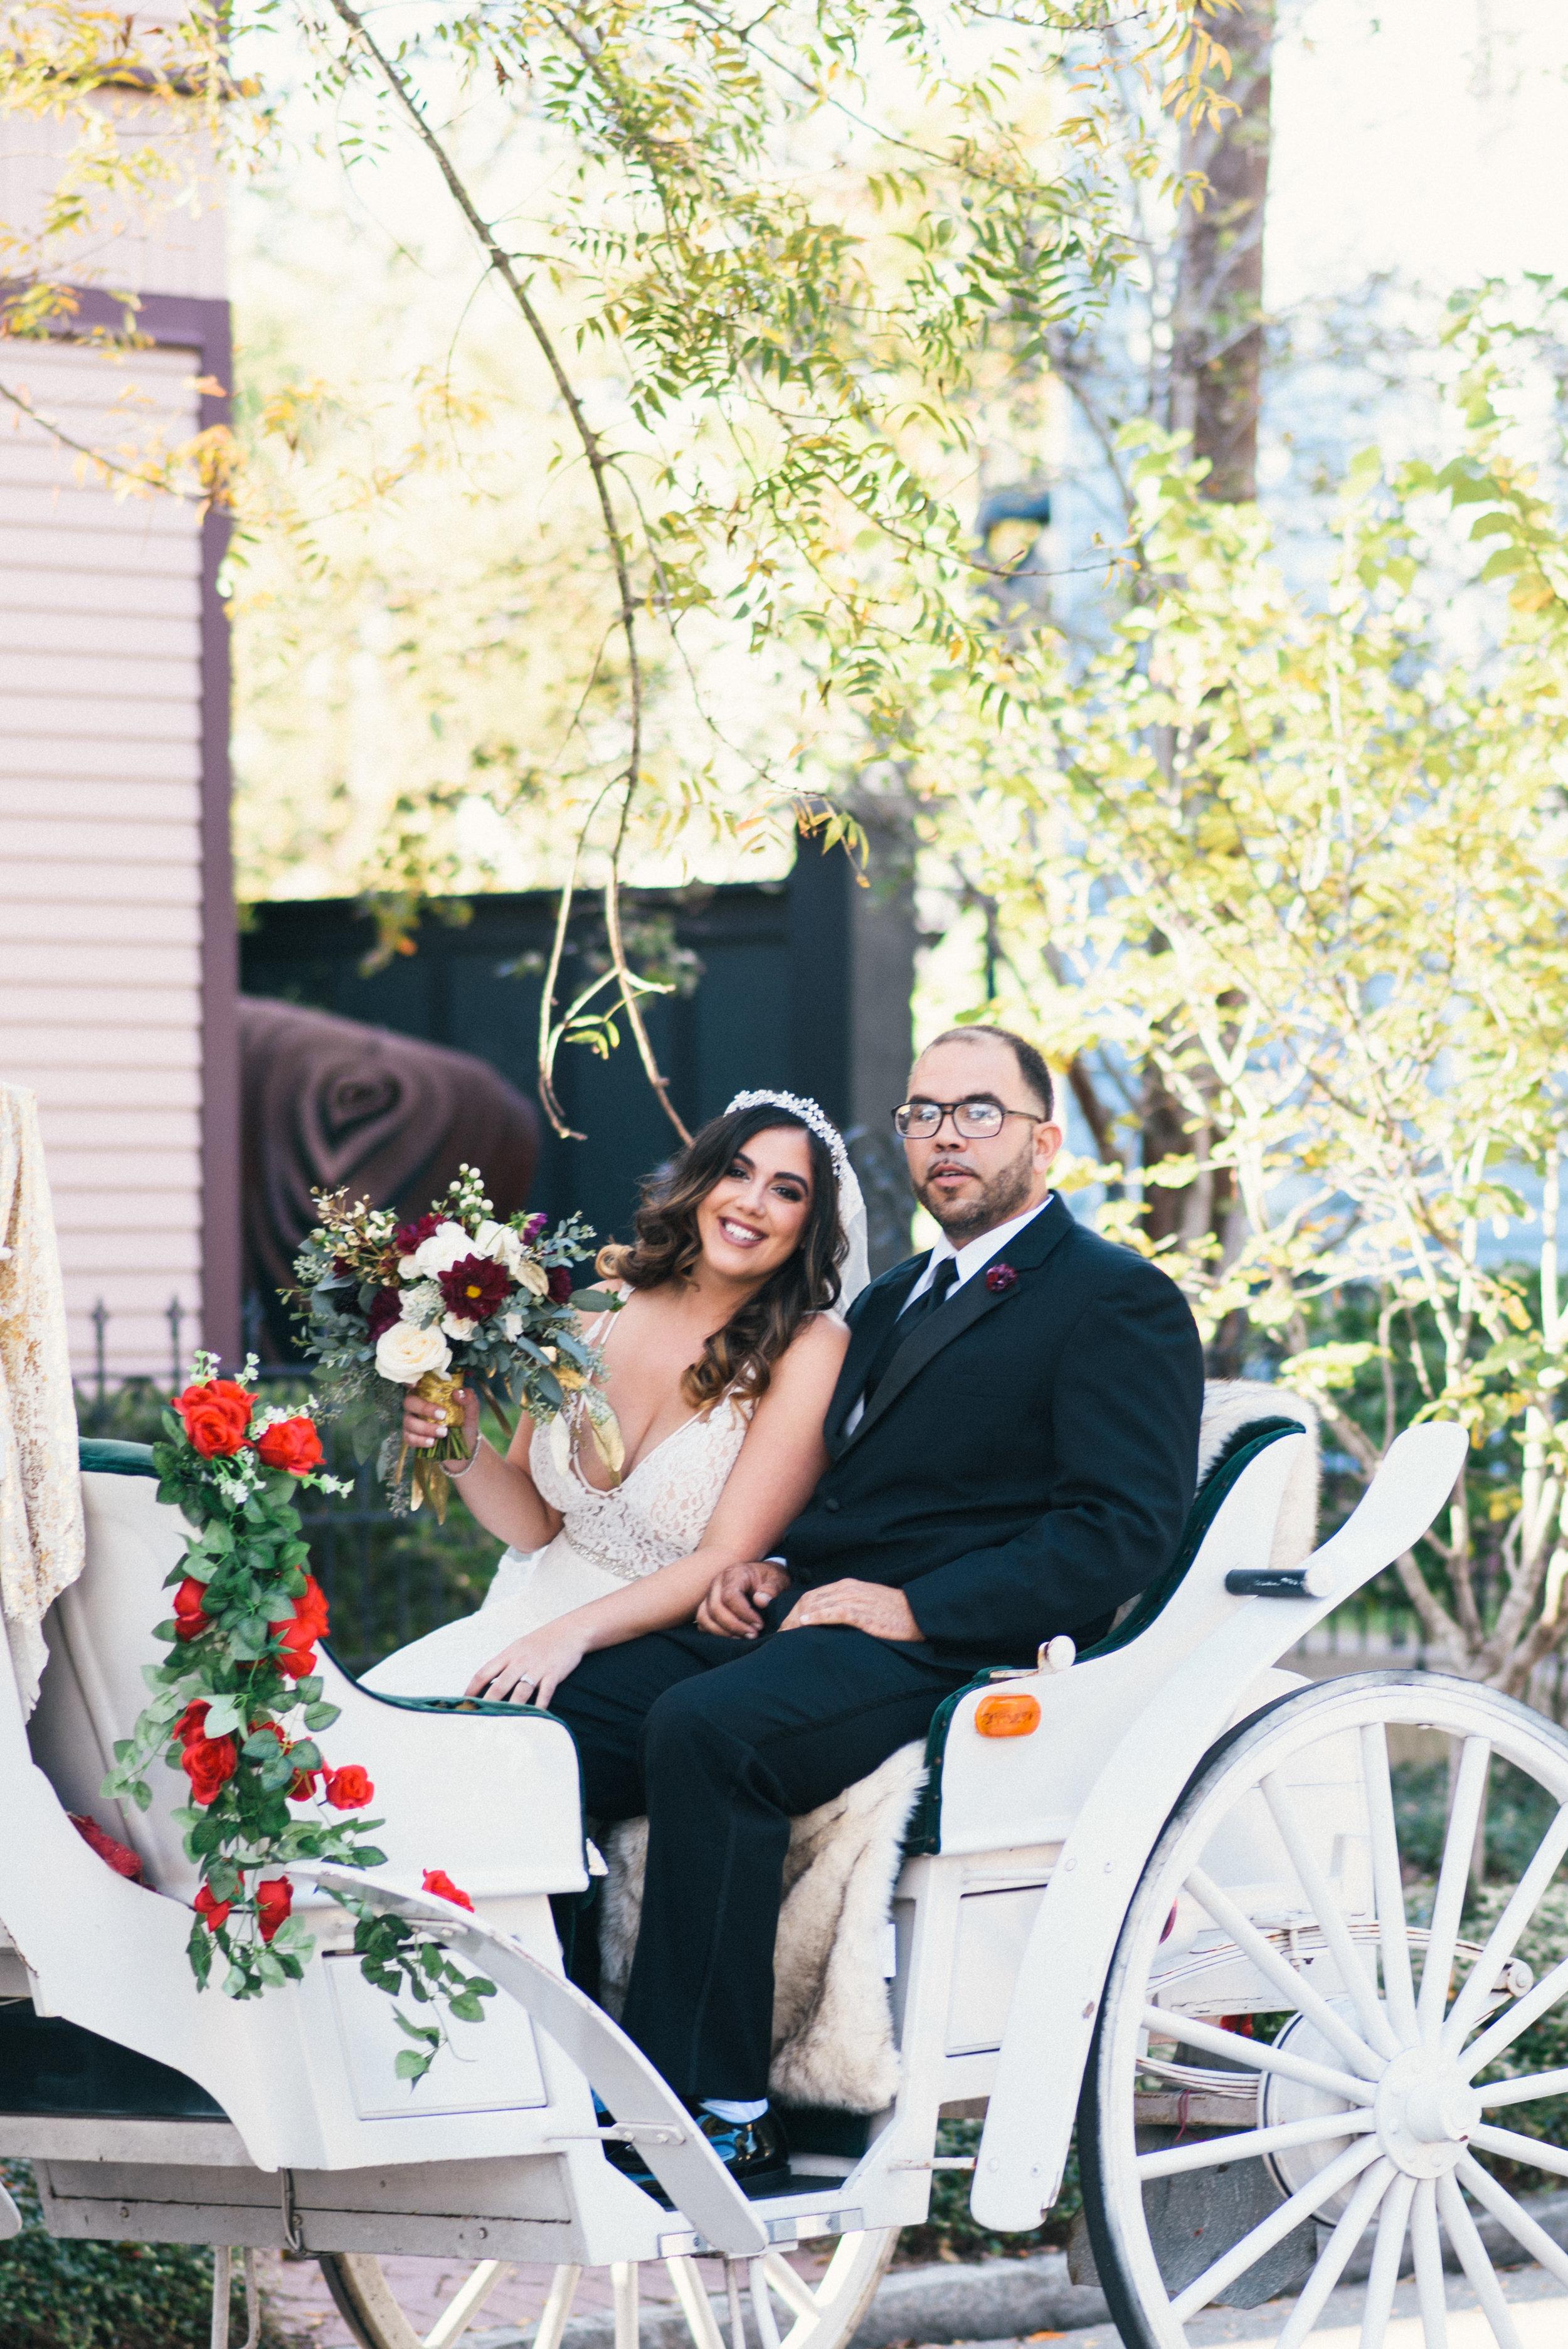 Iggy-and-yesenia-savannah-railroad-museum-wedding-meg-hill-photo- (326 of 1037).jpg